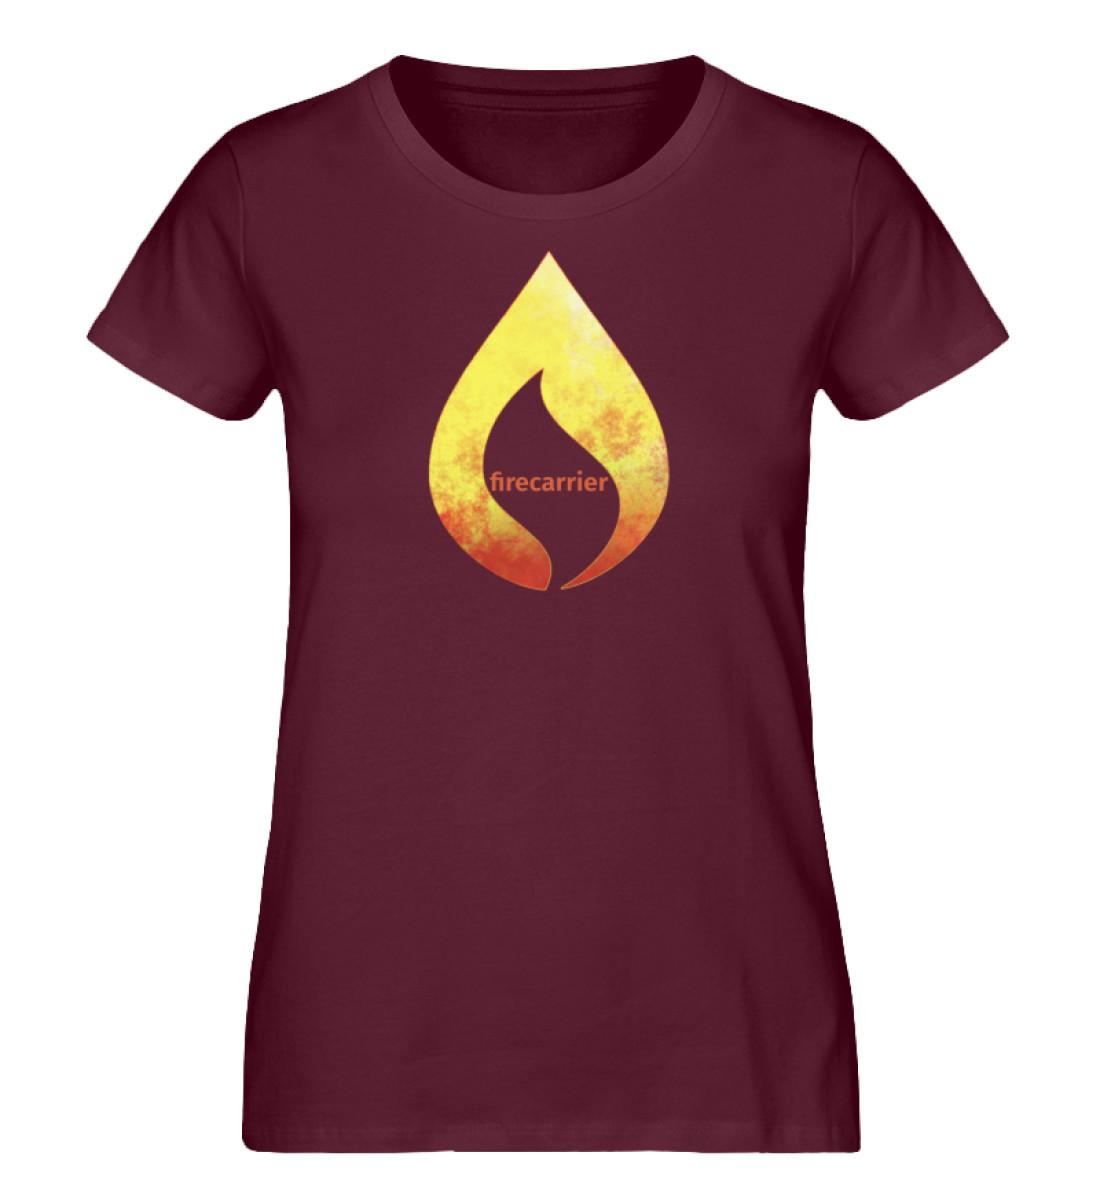 hot fire - Damen Premium Organic Shirt-839